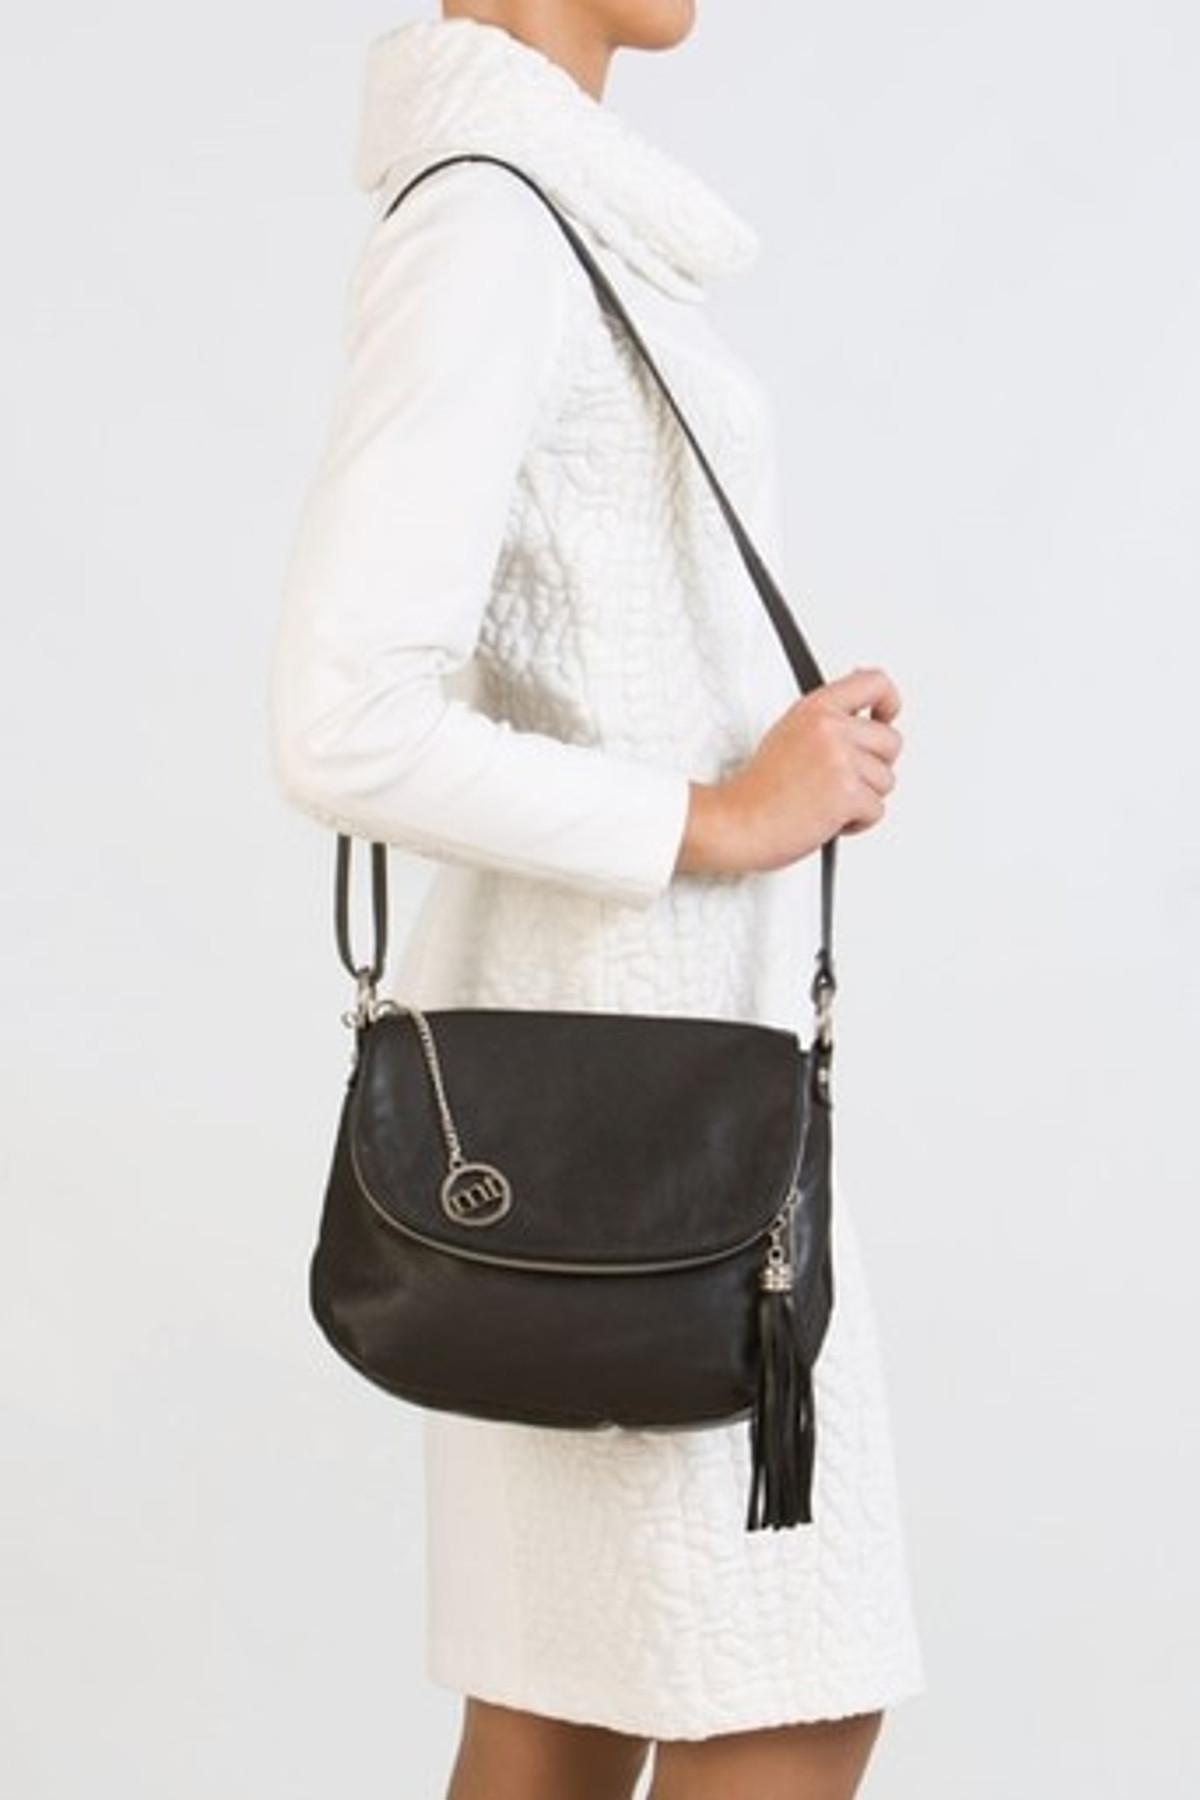 Bausan Handbag WB14002